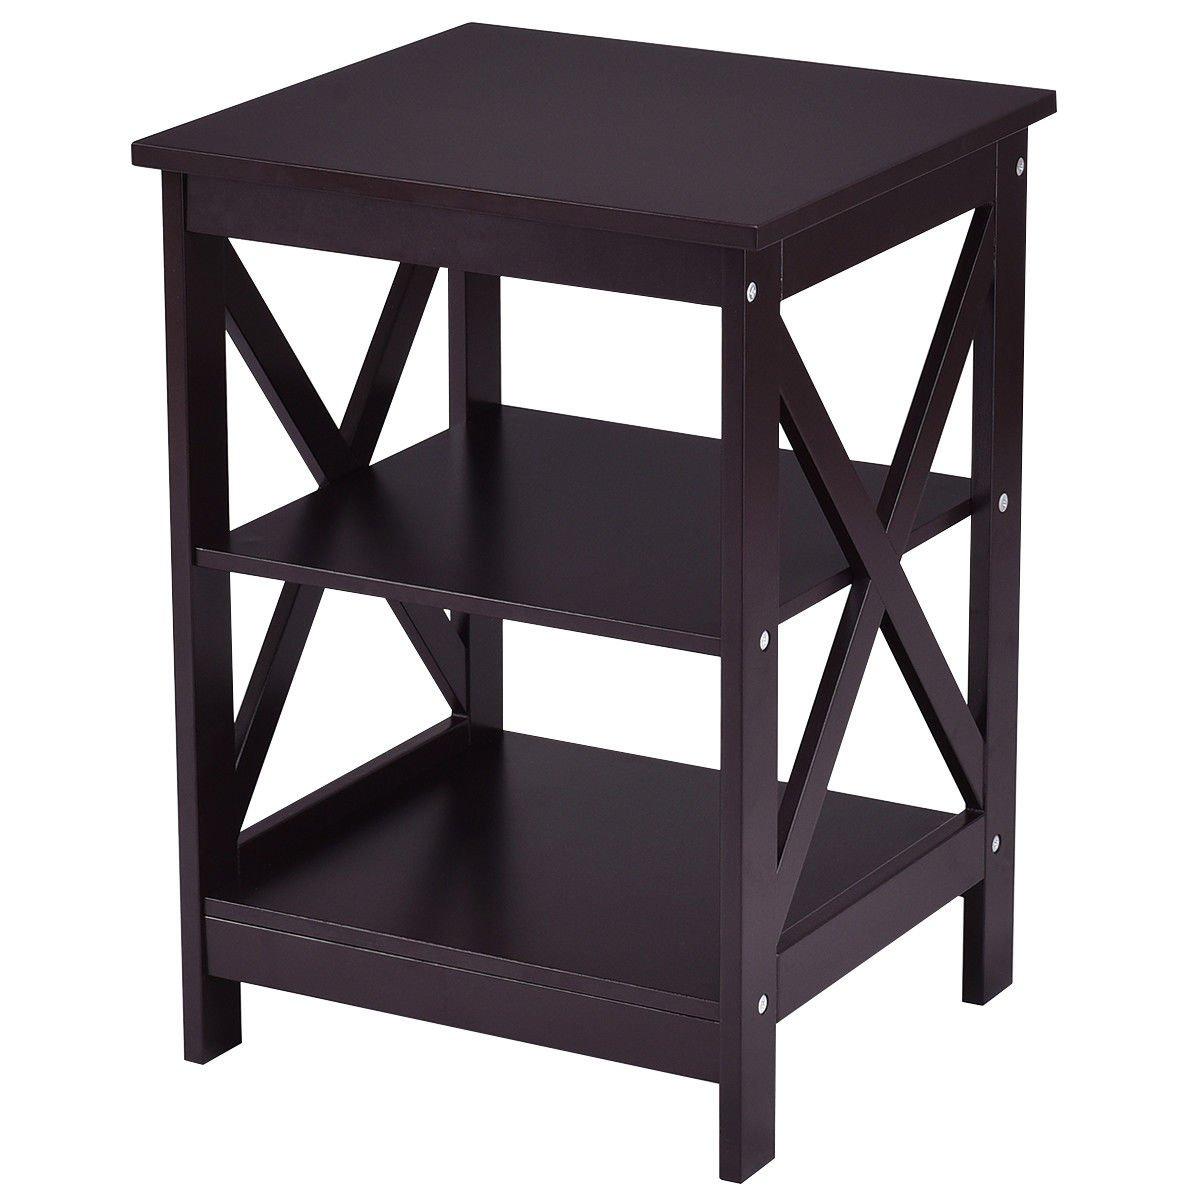 End Table 3 Tiers Storage Display Shelf Nightstand Living Room Furniture Espresso